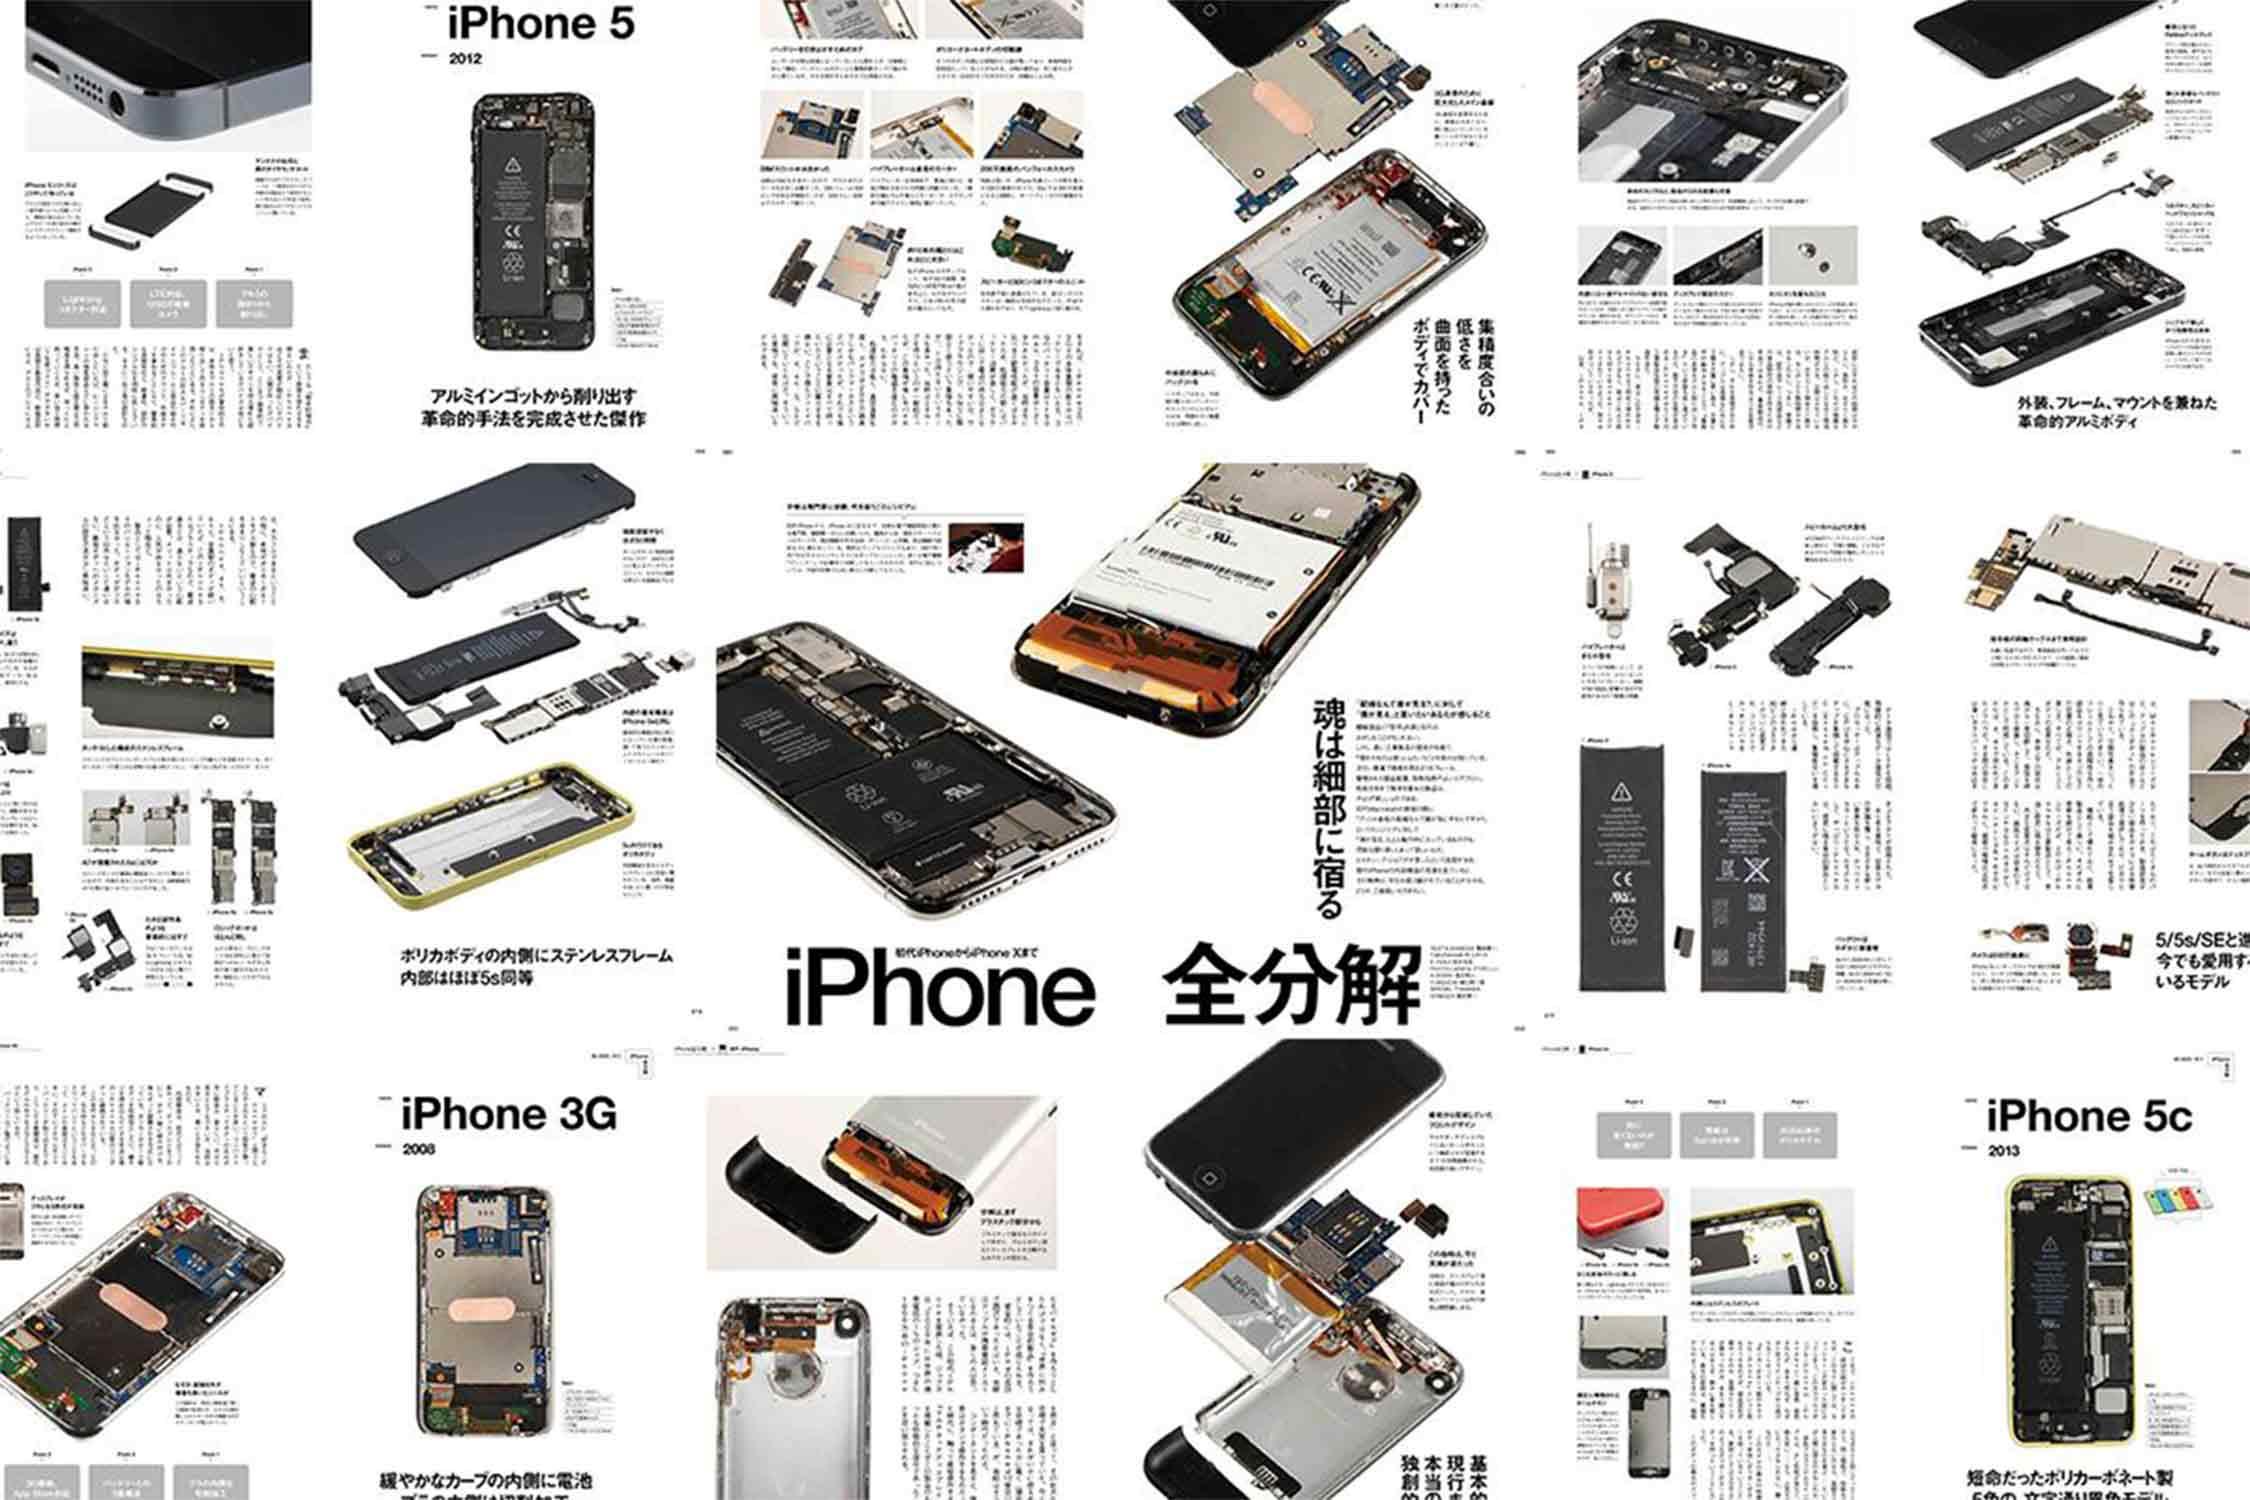 iPhone ネジ一本の変遷 イメージ